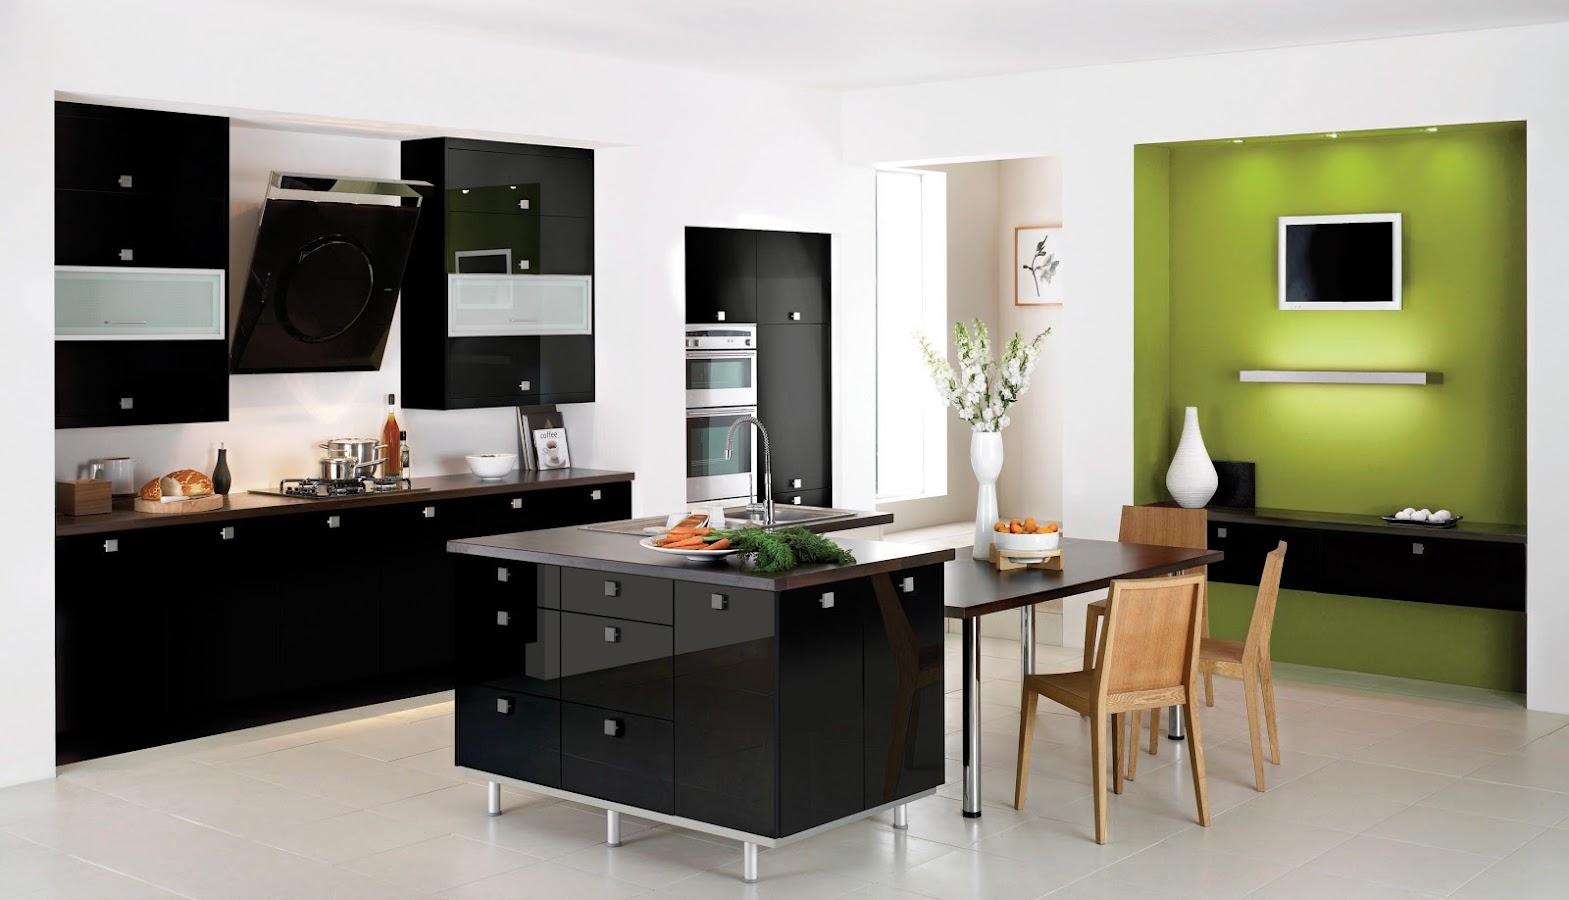 kitchen design kitchen. kitchen design premium screenshot